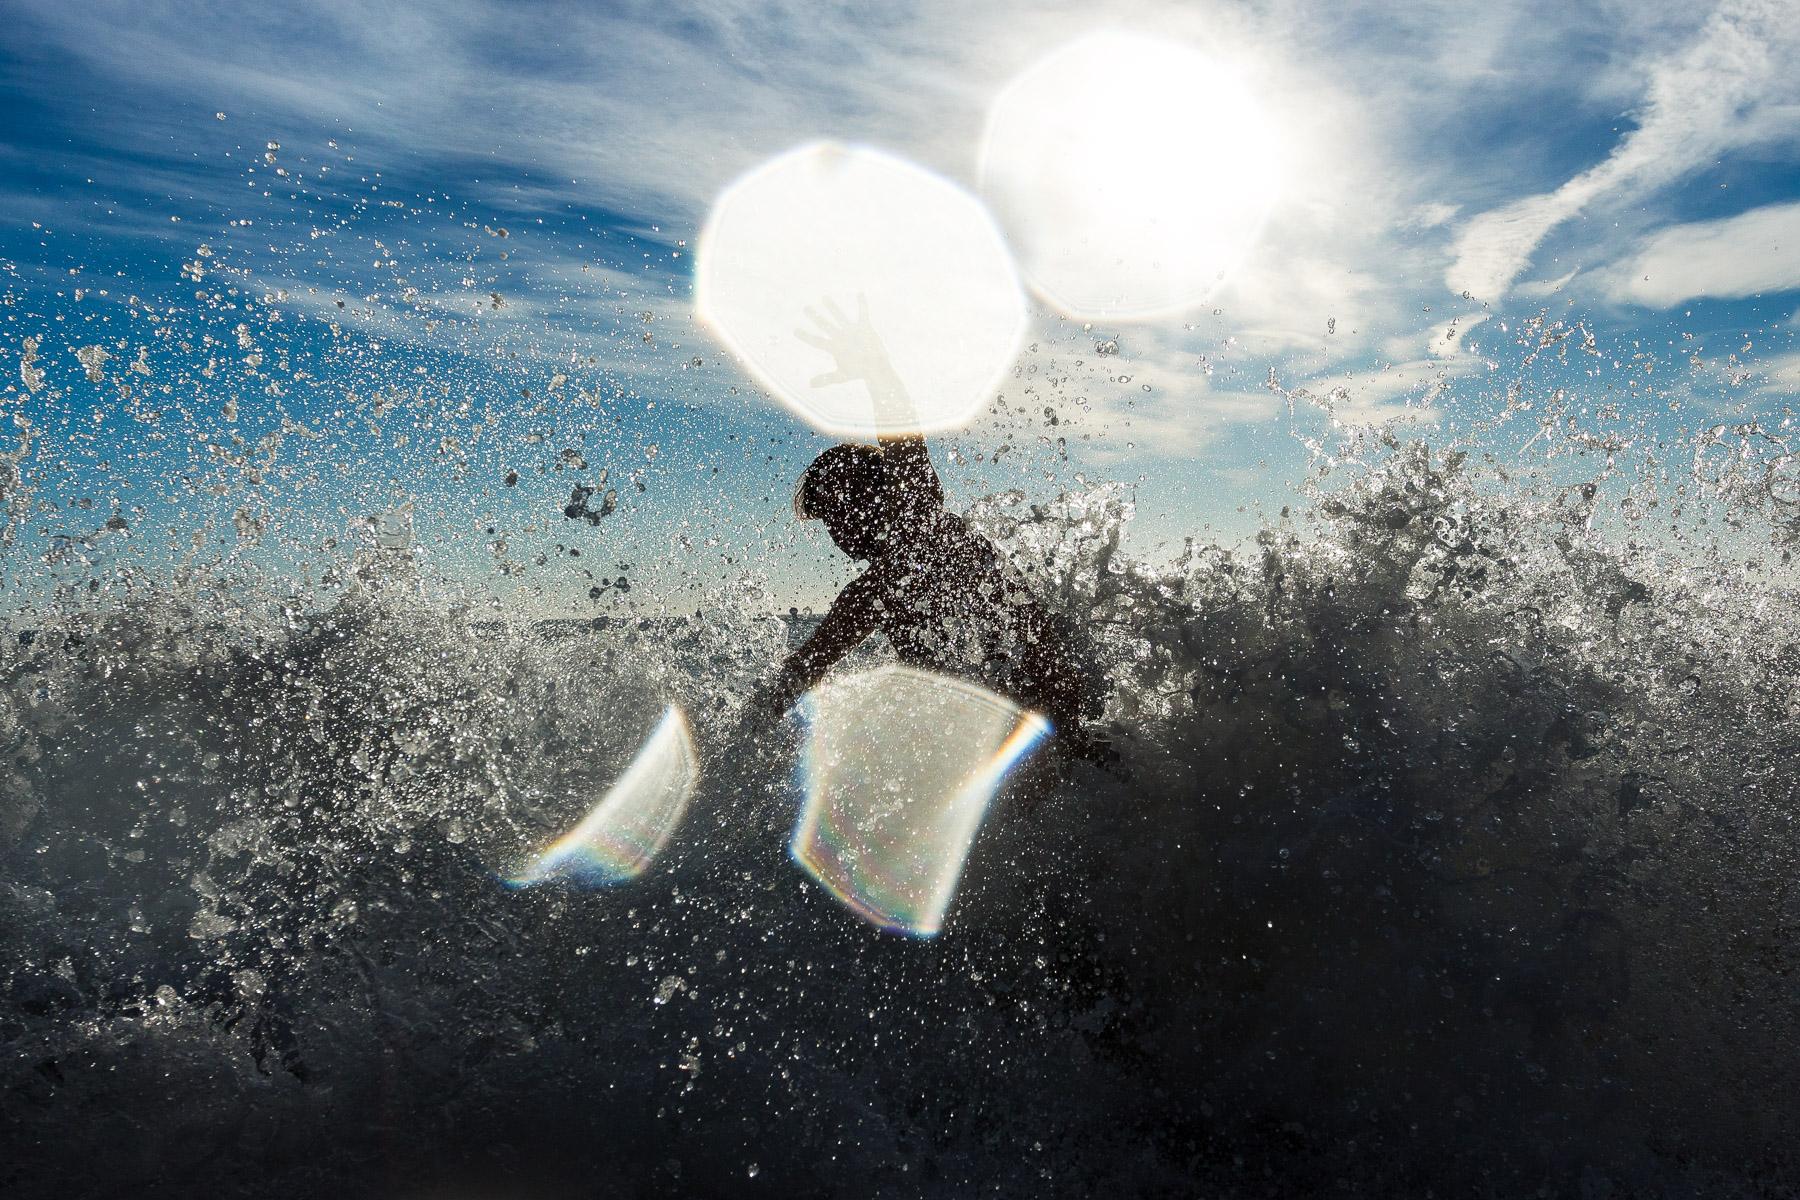 splash by christoph neumann